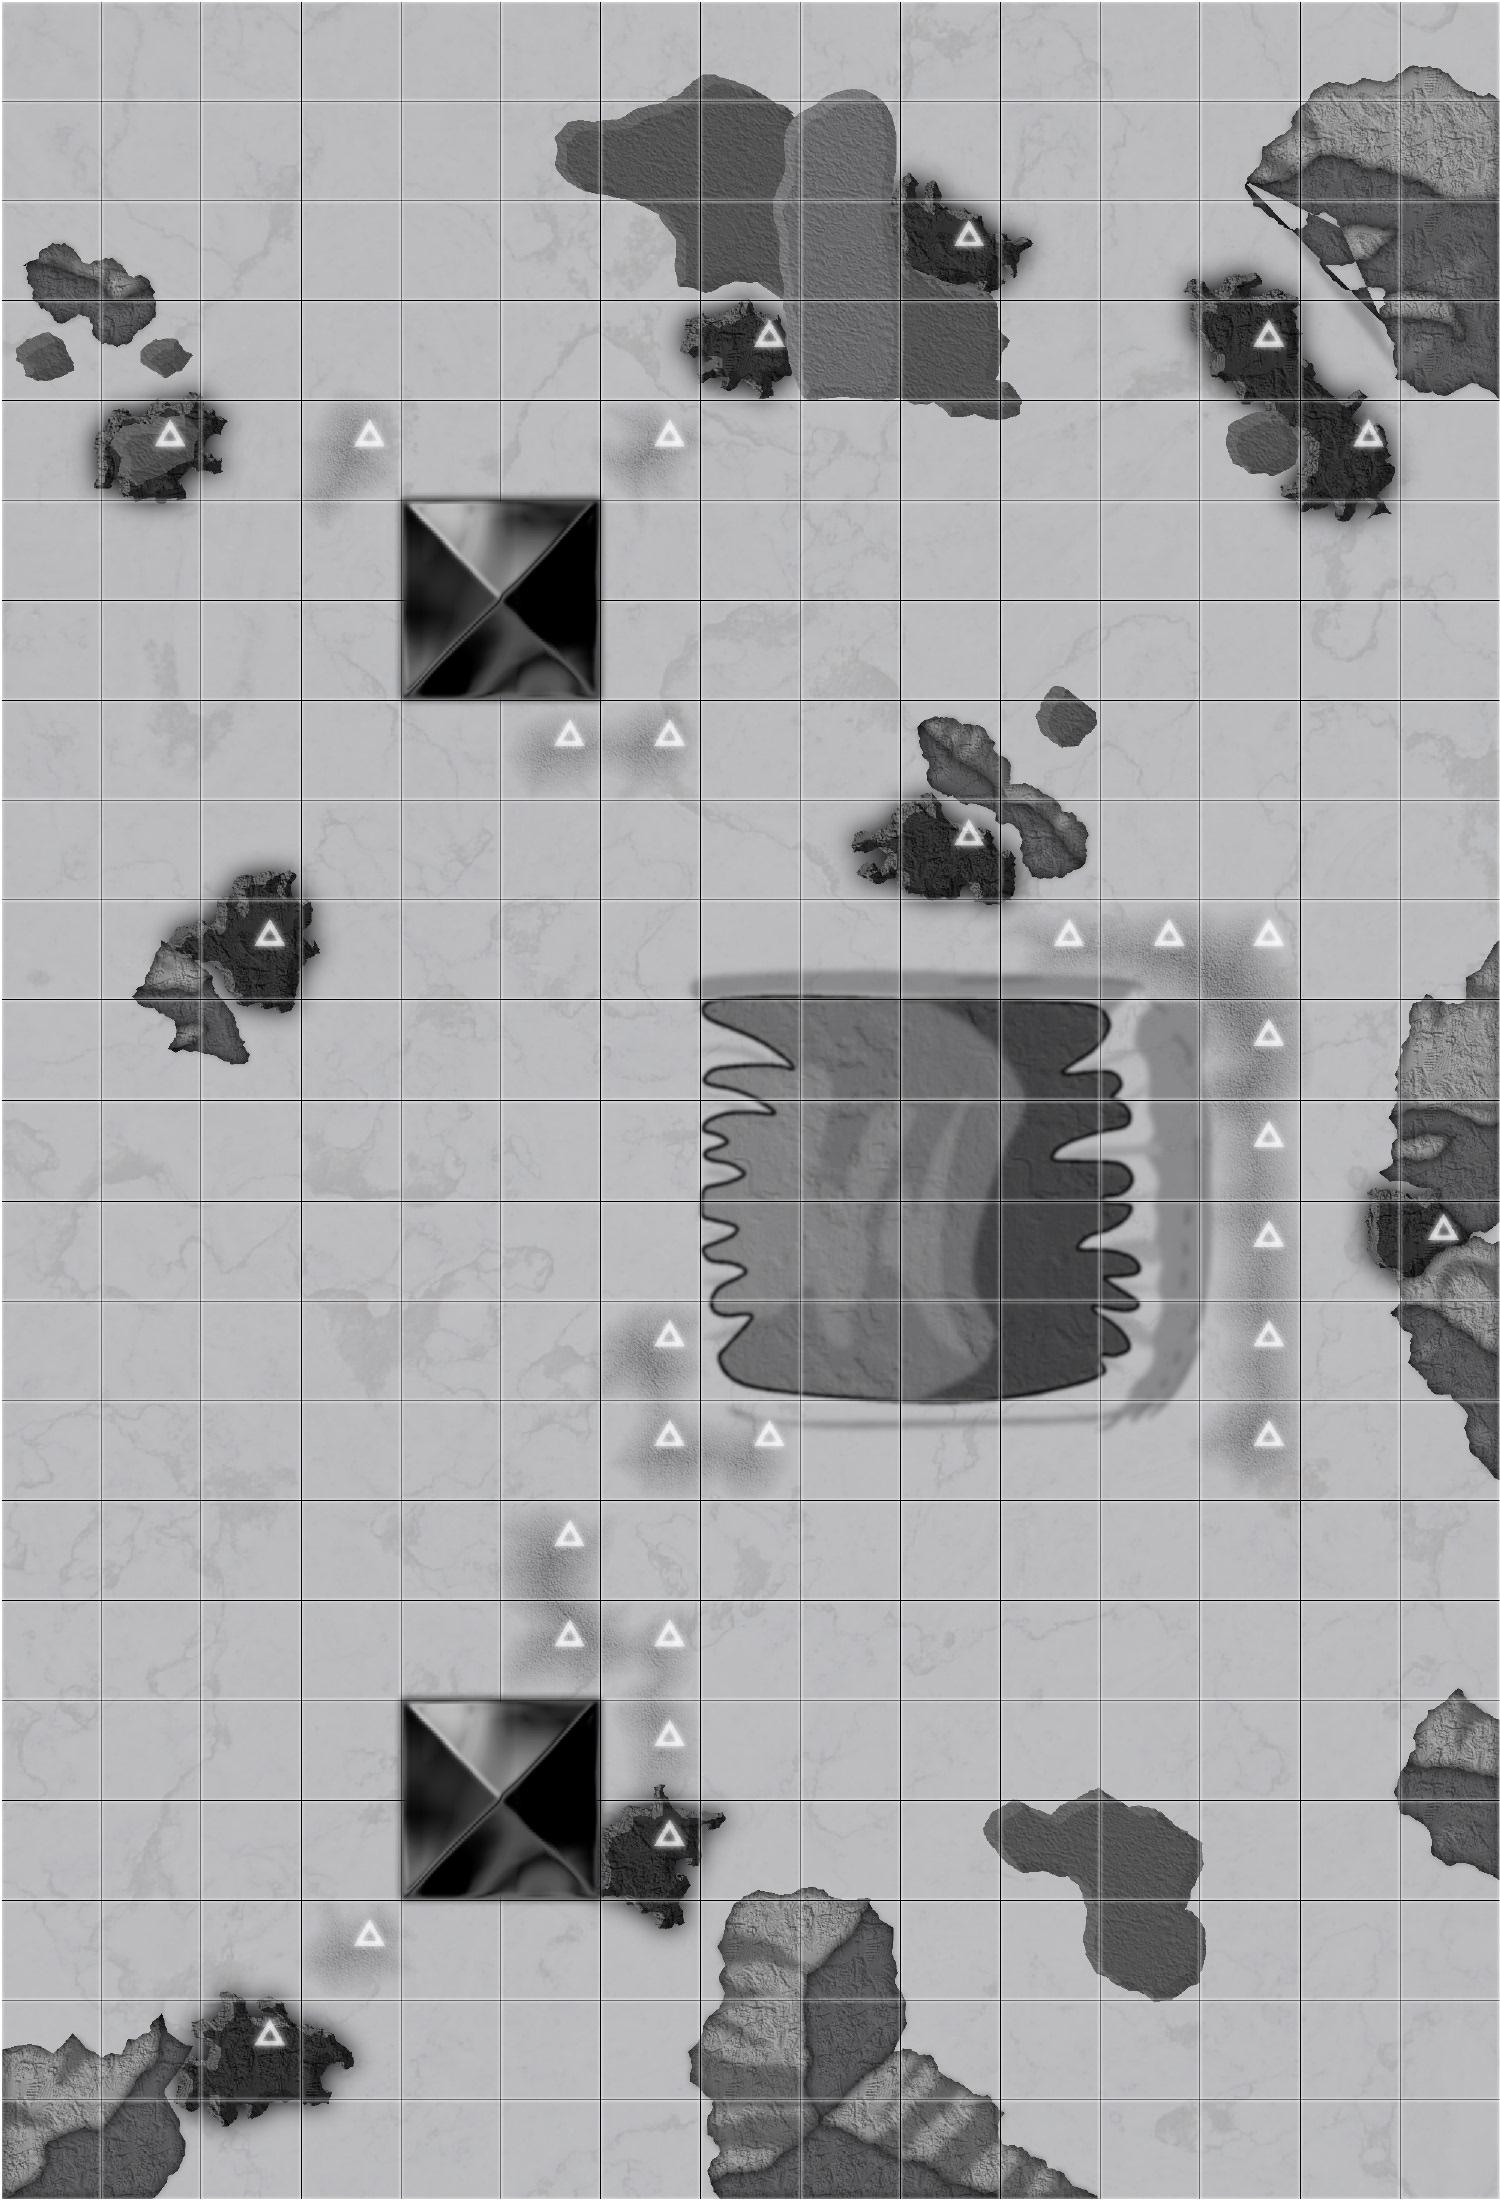 D8   Reliquary Approach (100 px, Grid)